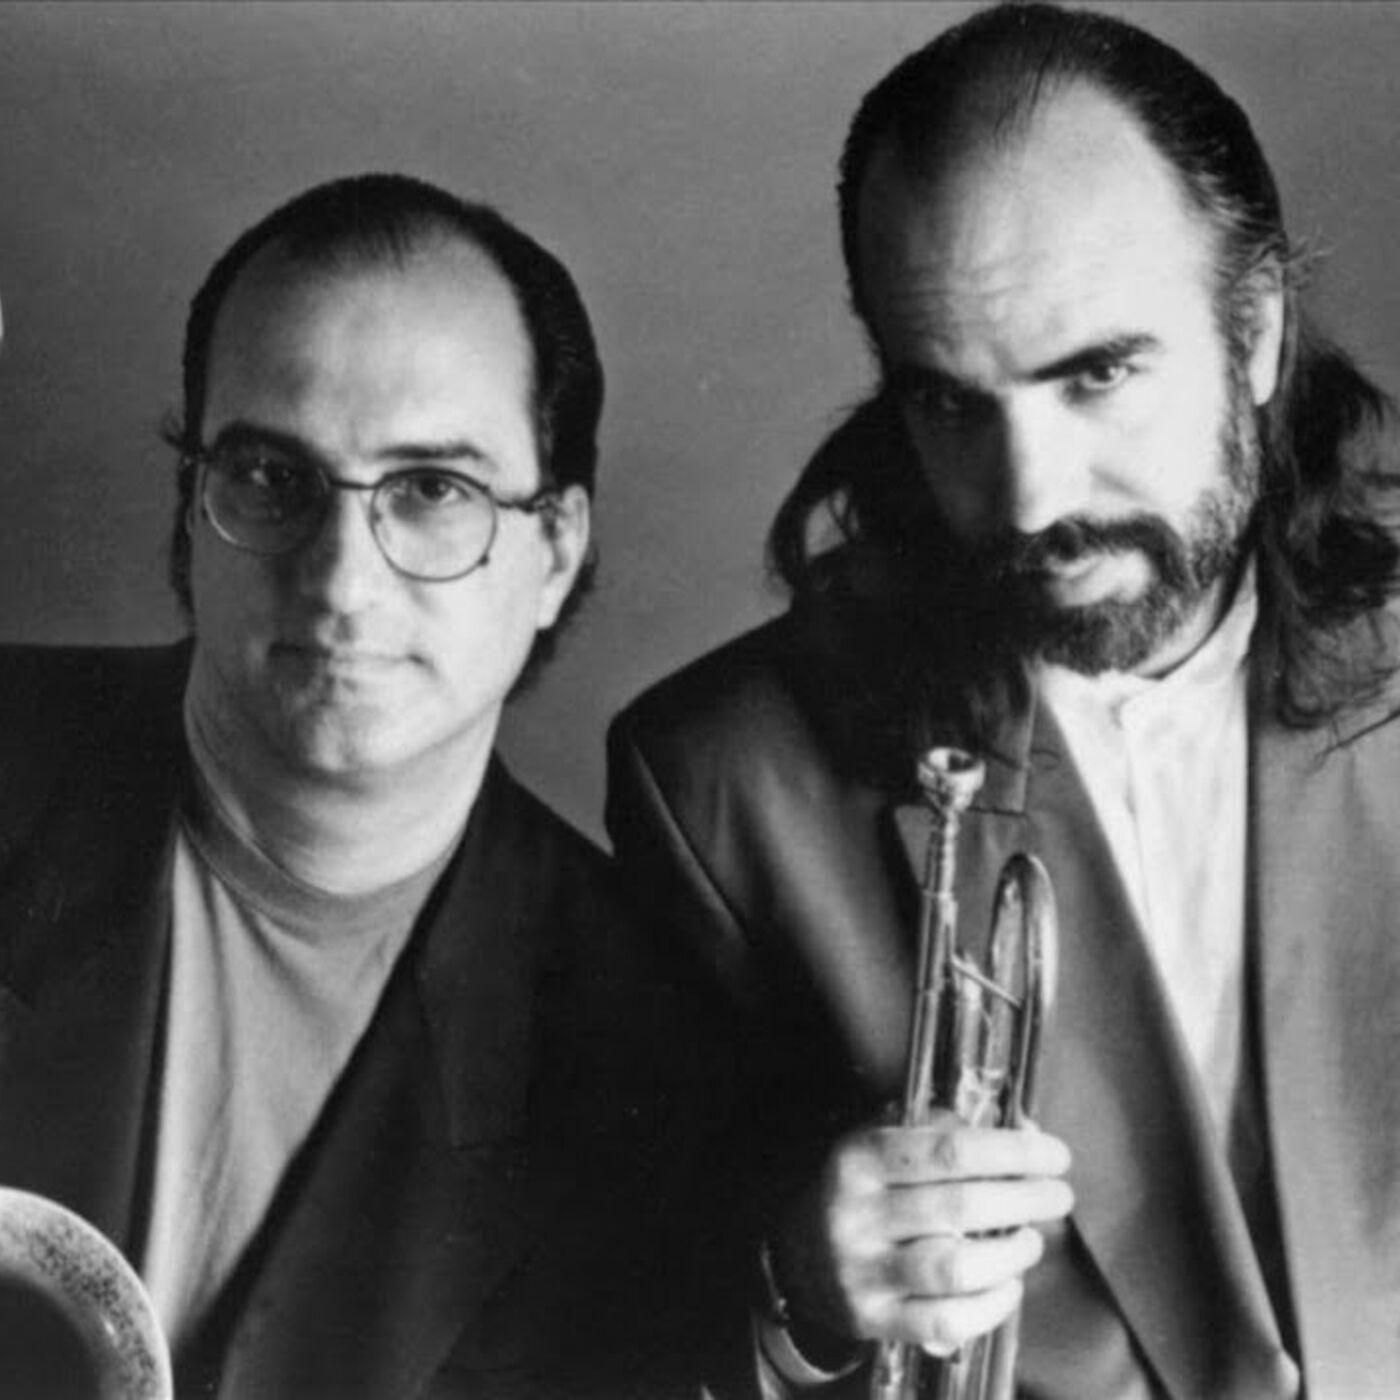 Jazz Bastard Podcast 195 - The Cocaine Years